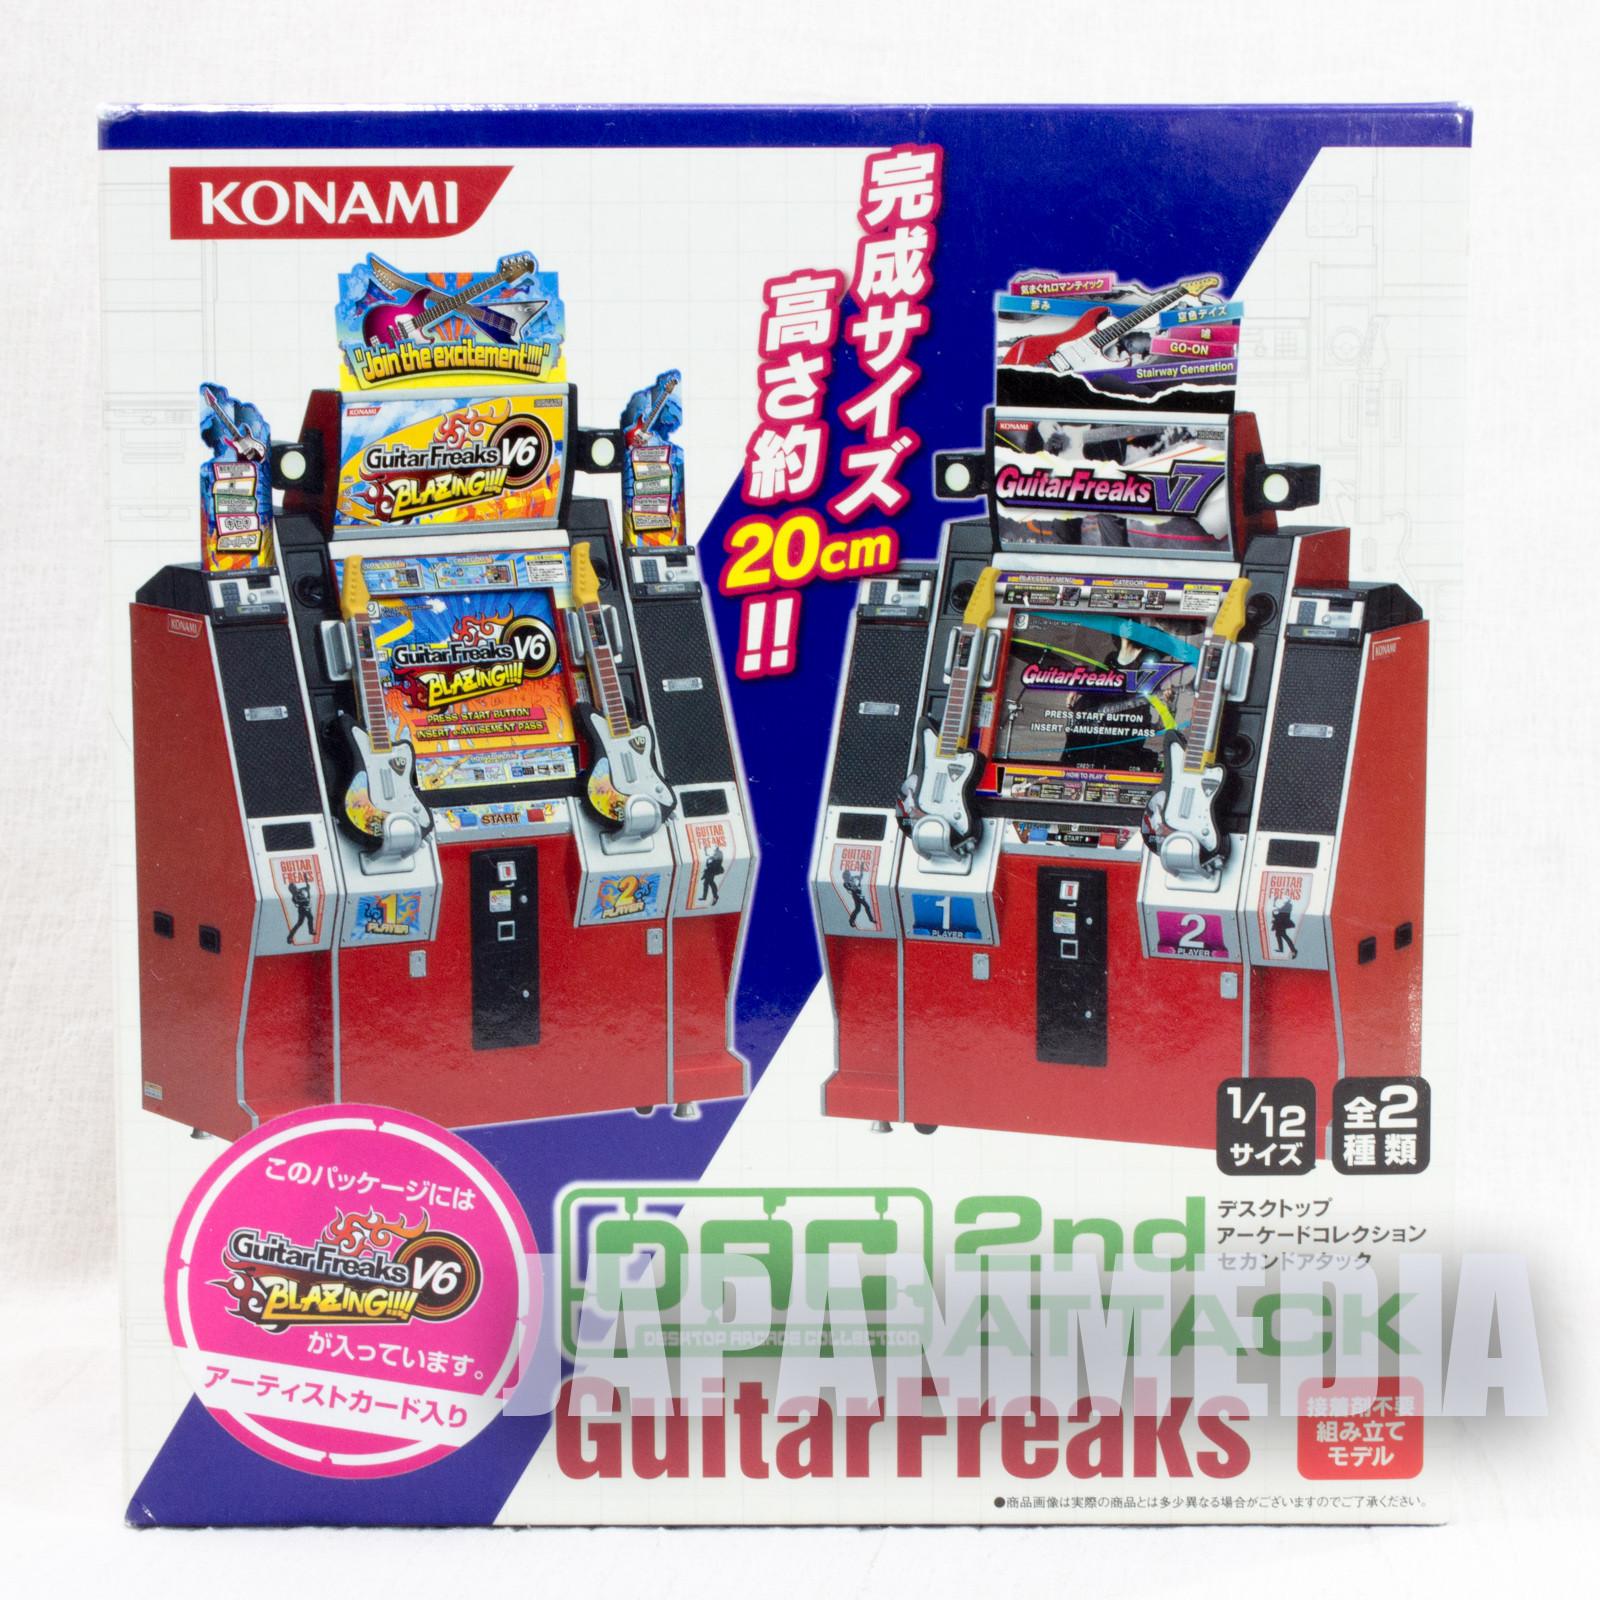 RARE!! Desktop Arcade Collection Guitar Freaks V6 1/12 Miniature Figure Konami